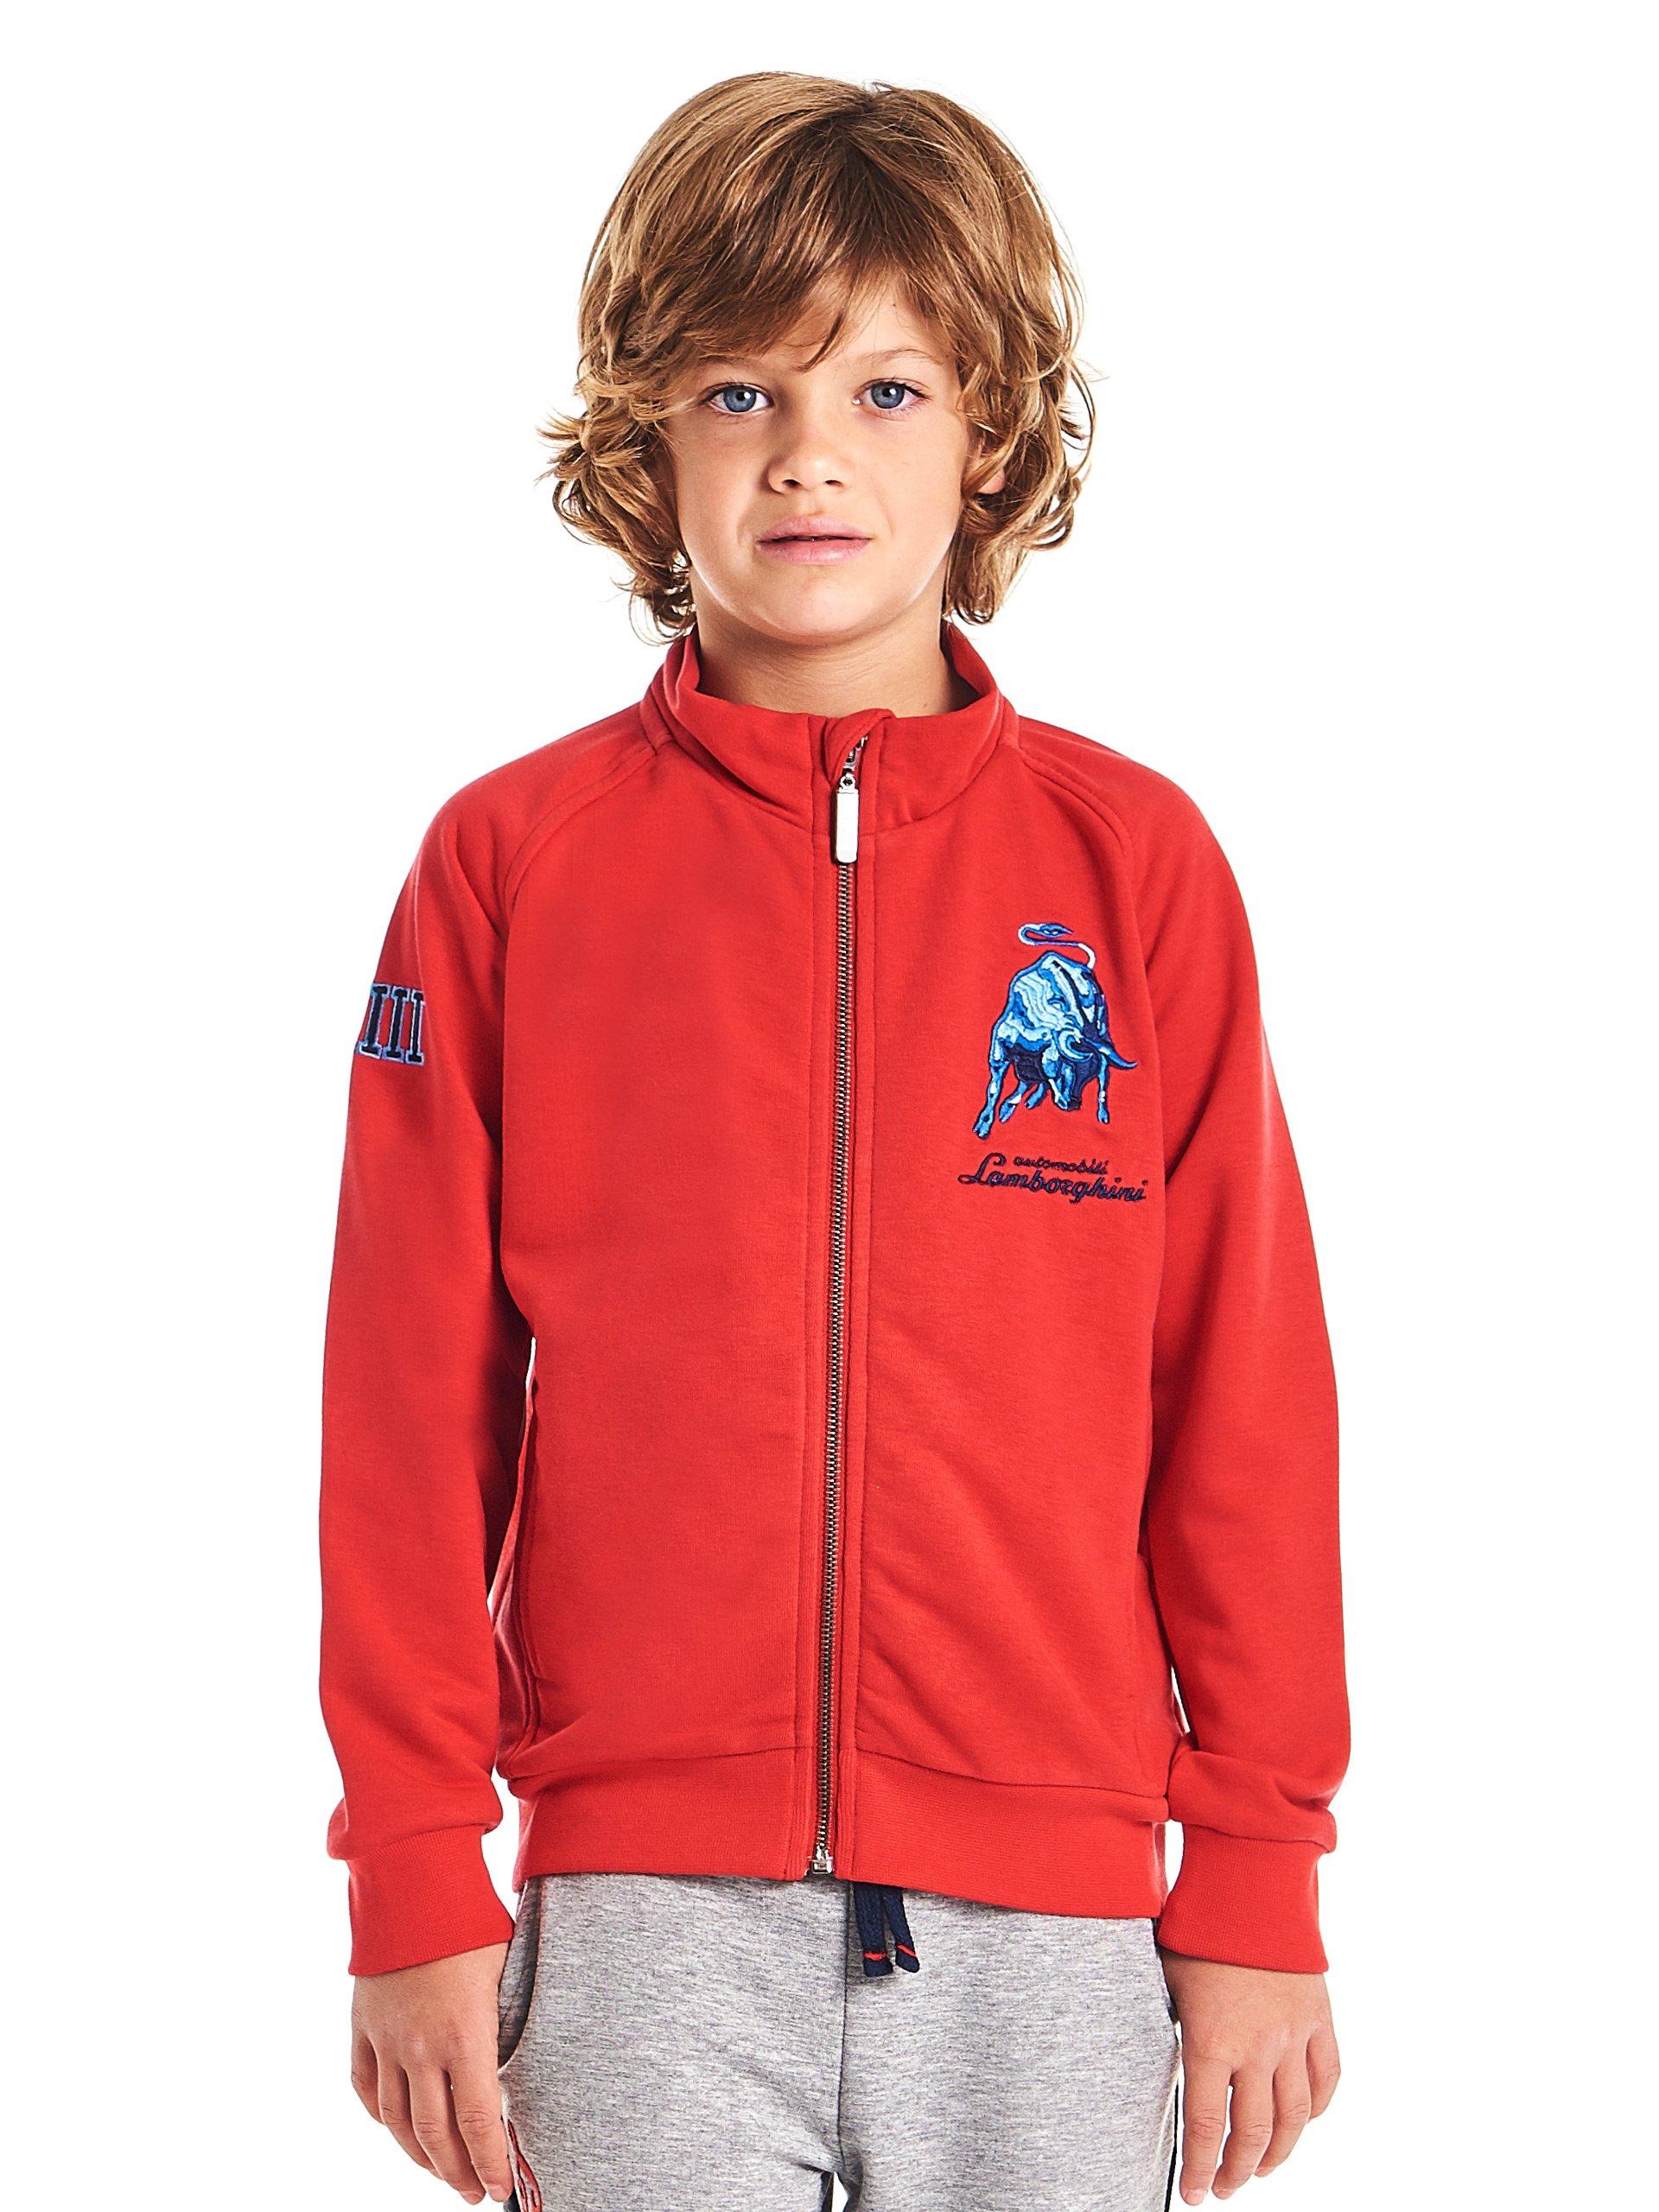 Automobili Lamborghini Children Lamborghini Kids Bull LXIII Sweatshirt 12 Years Red